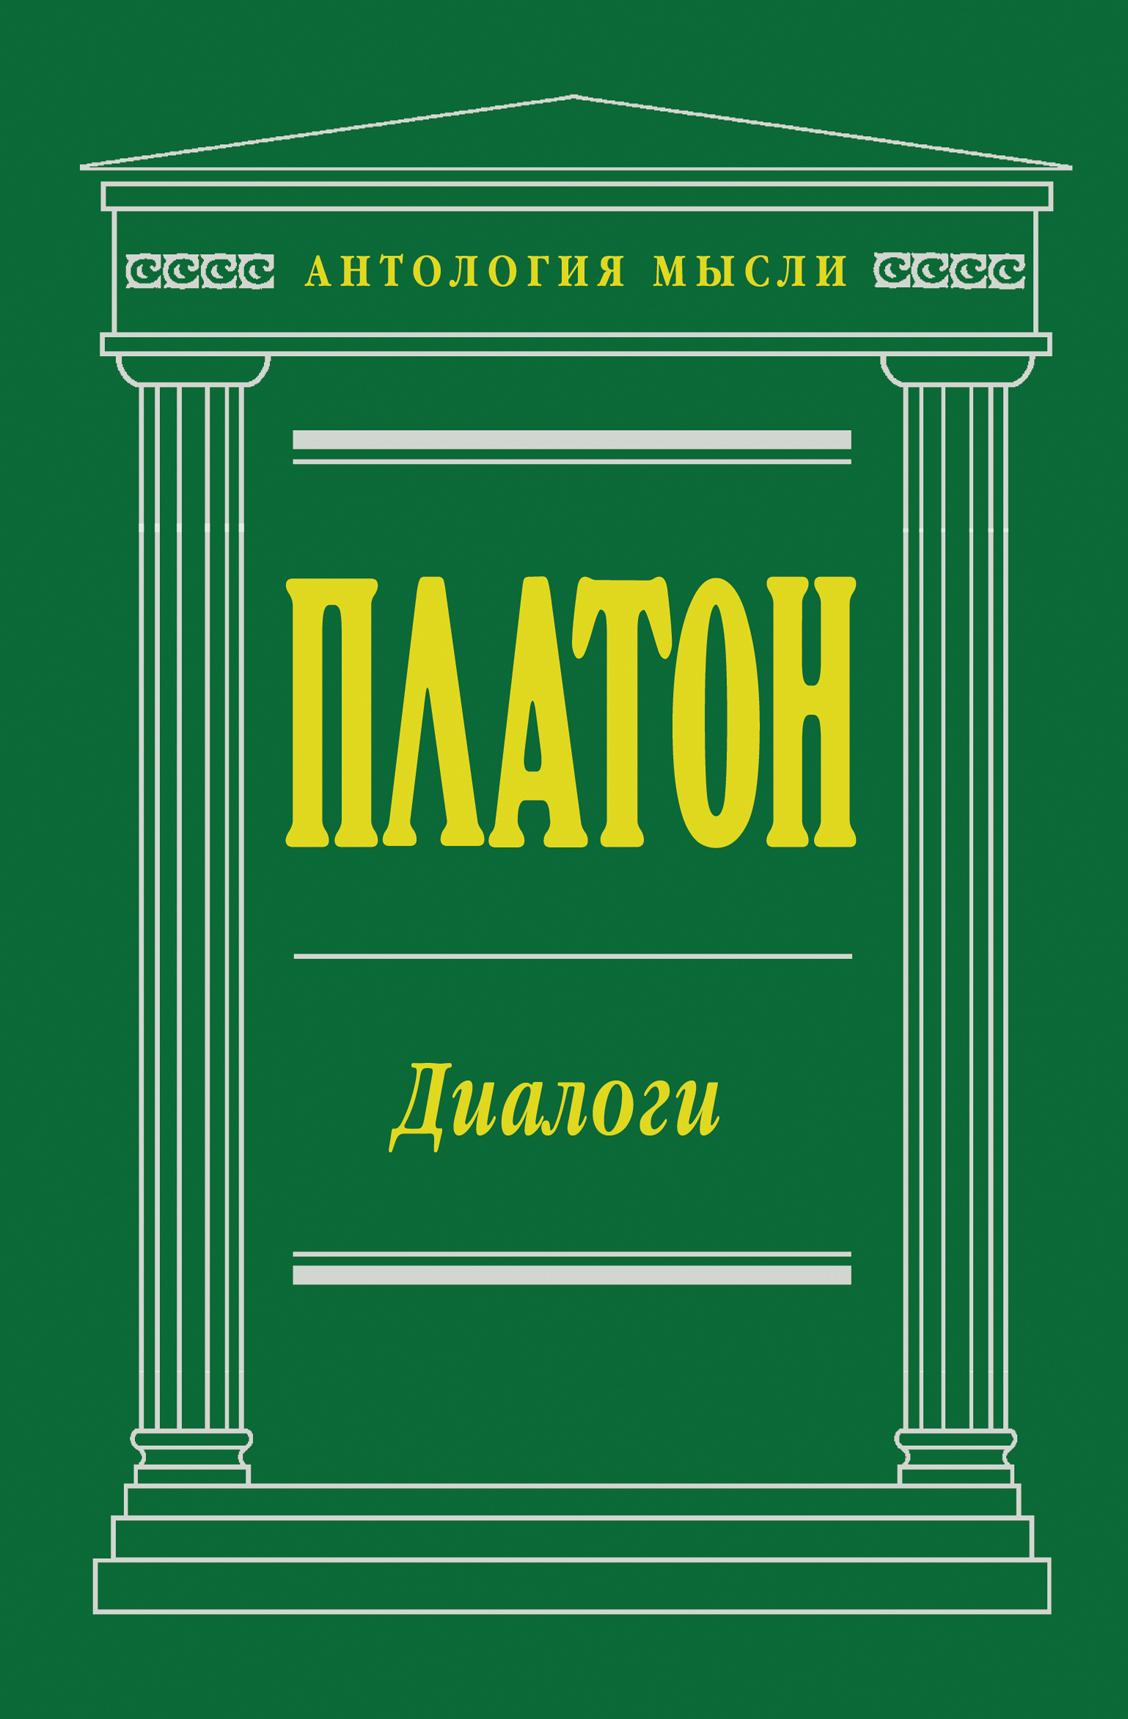 Платон Платон. Диалоги книга как то раз платон зашел в бар